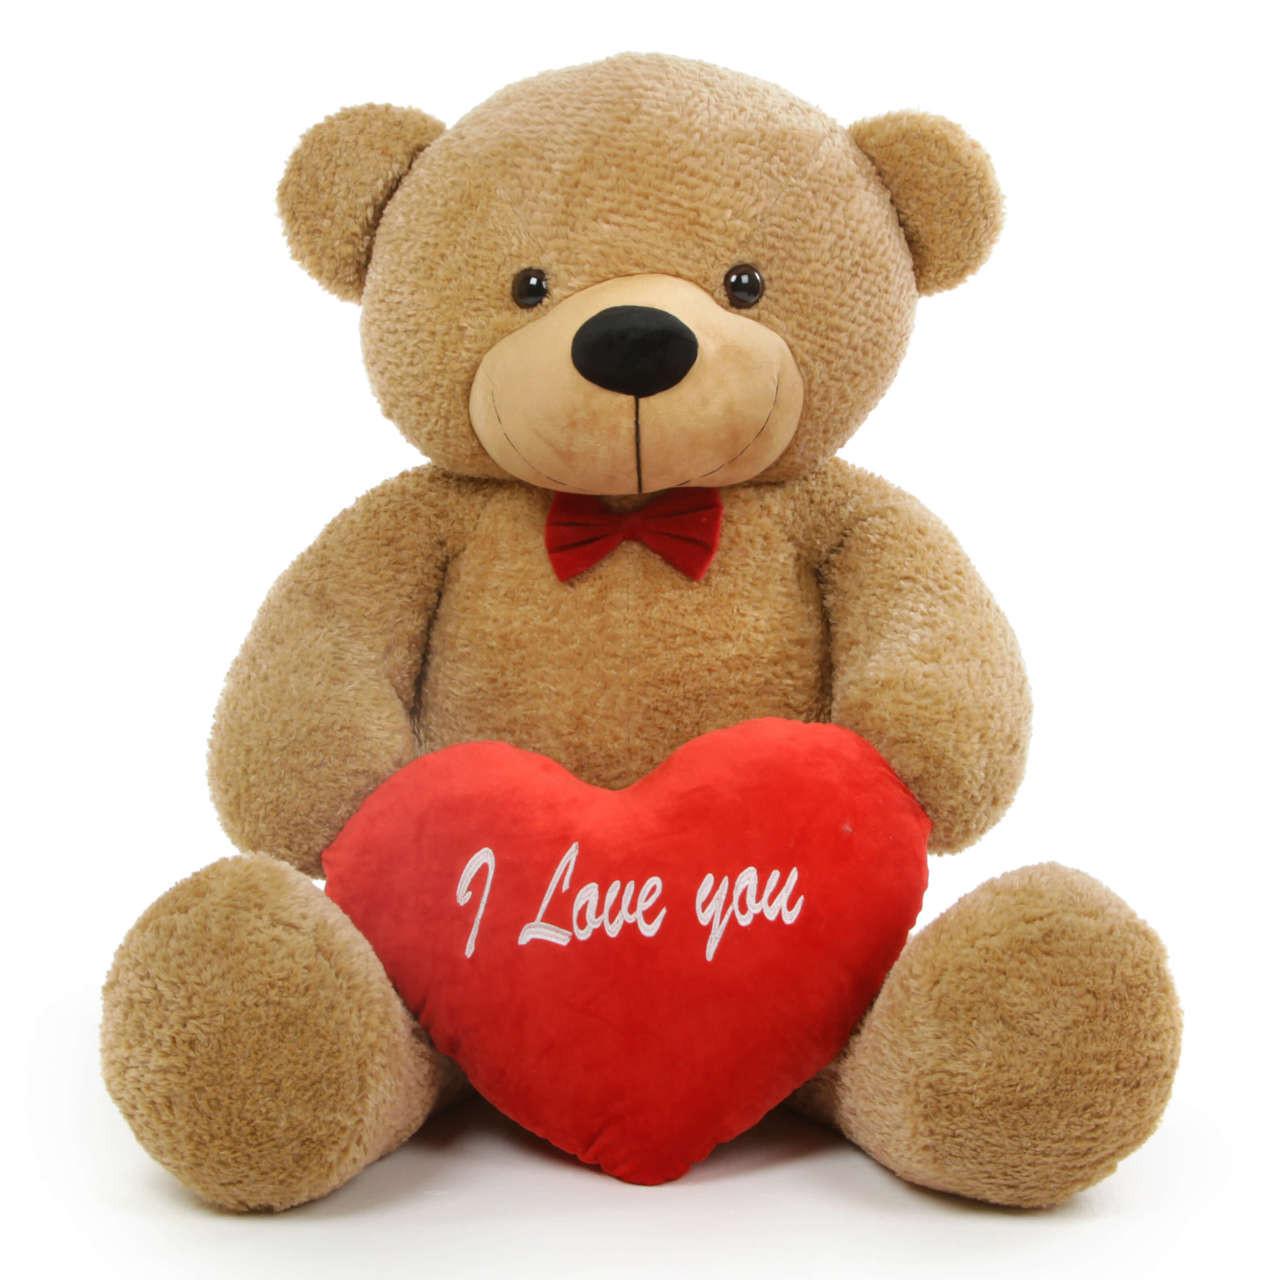 Shaggy L Cuddles 48 Amber Teddy Bear W I Love You Heart Giant